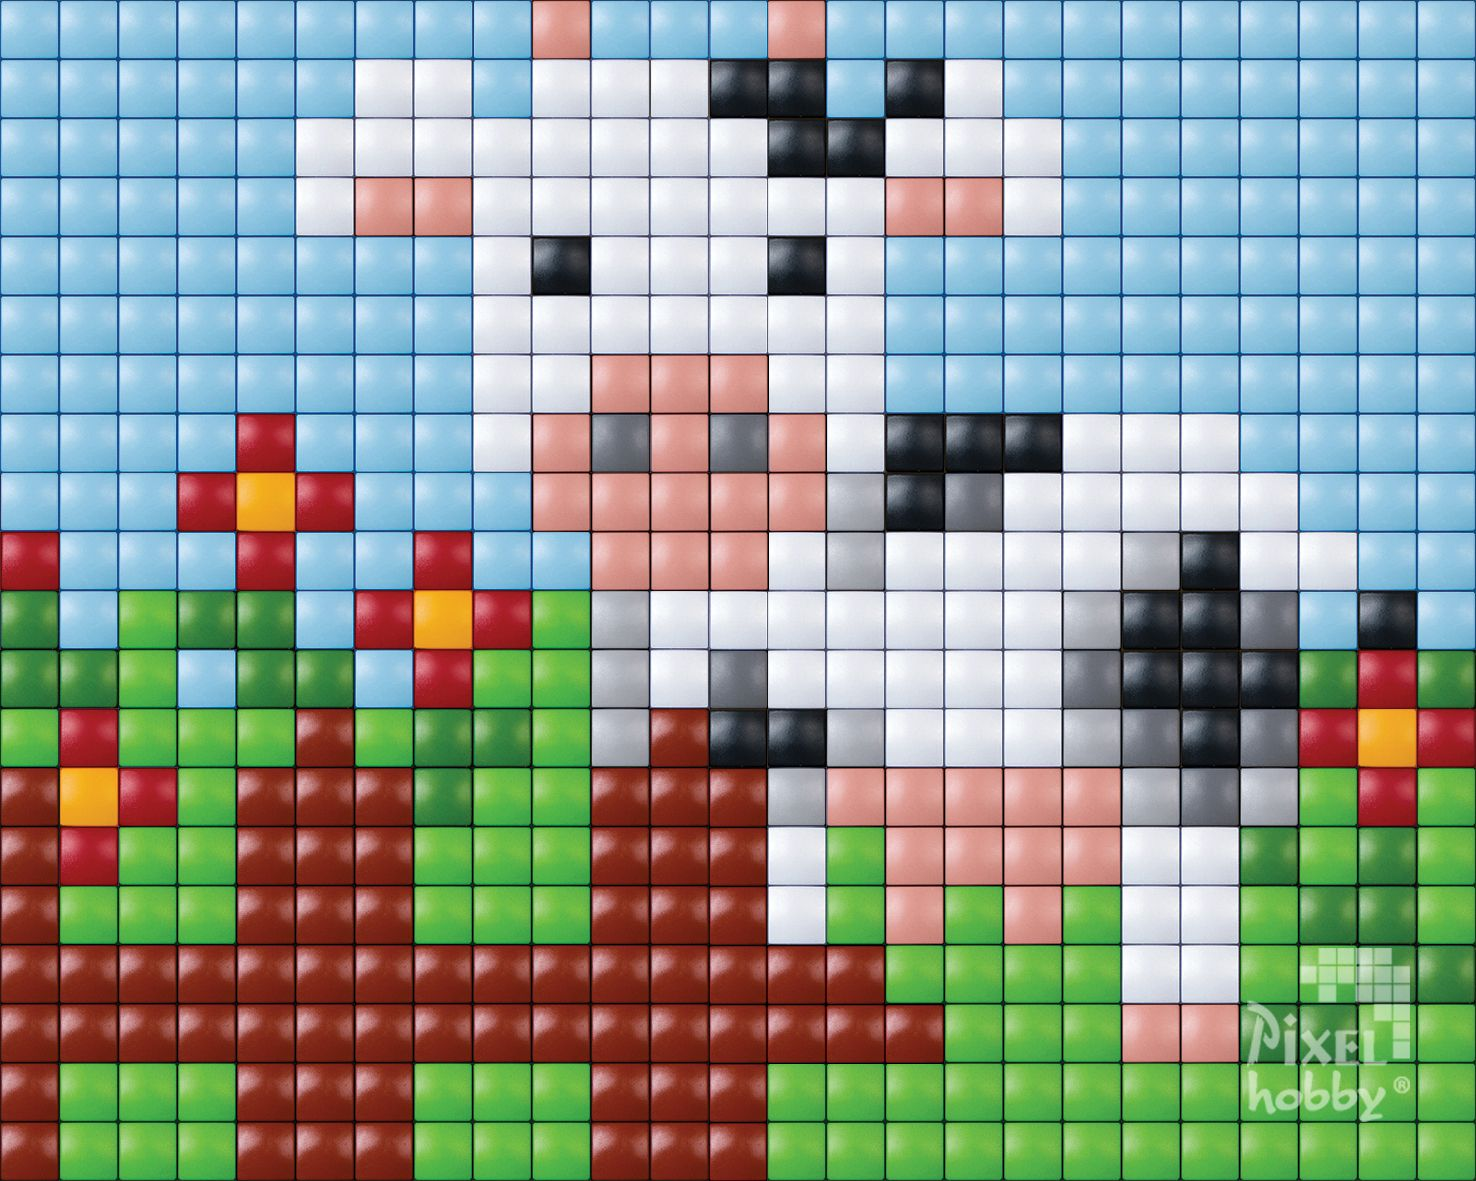 Pixelhobby Pixelen Pixelgift Koe Cow Kids Toy Hobby